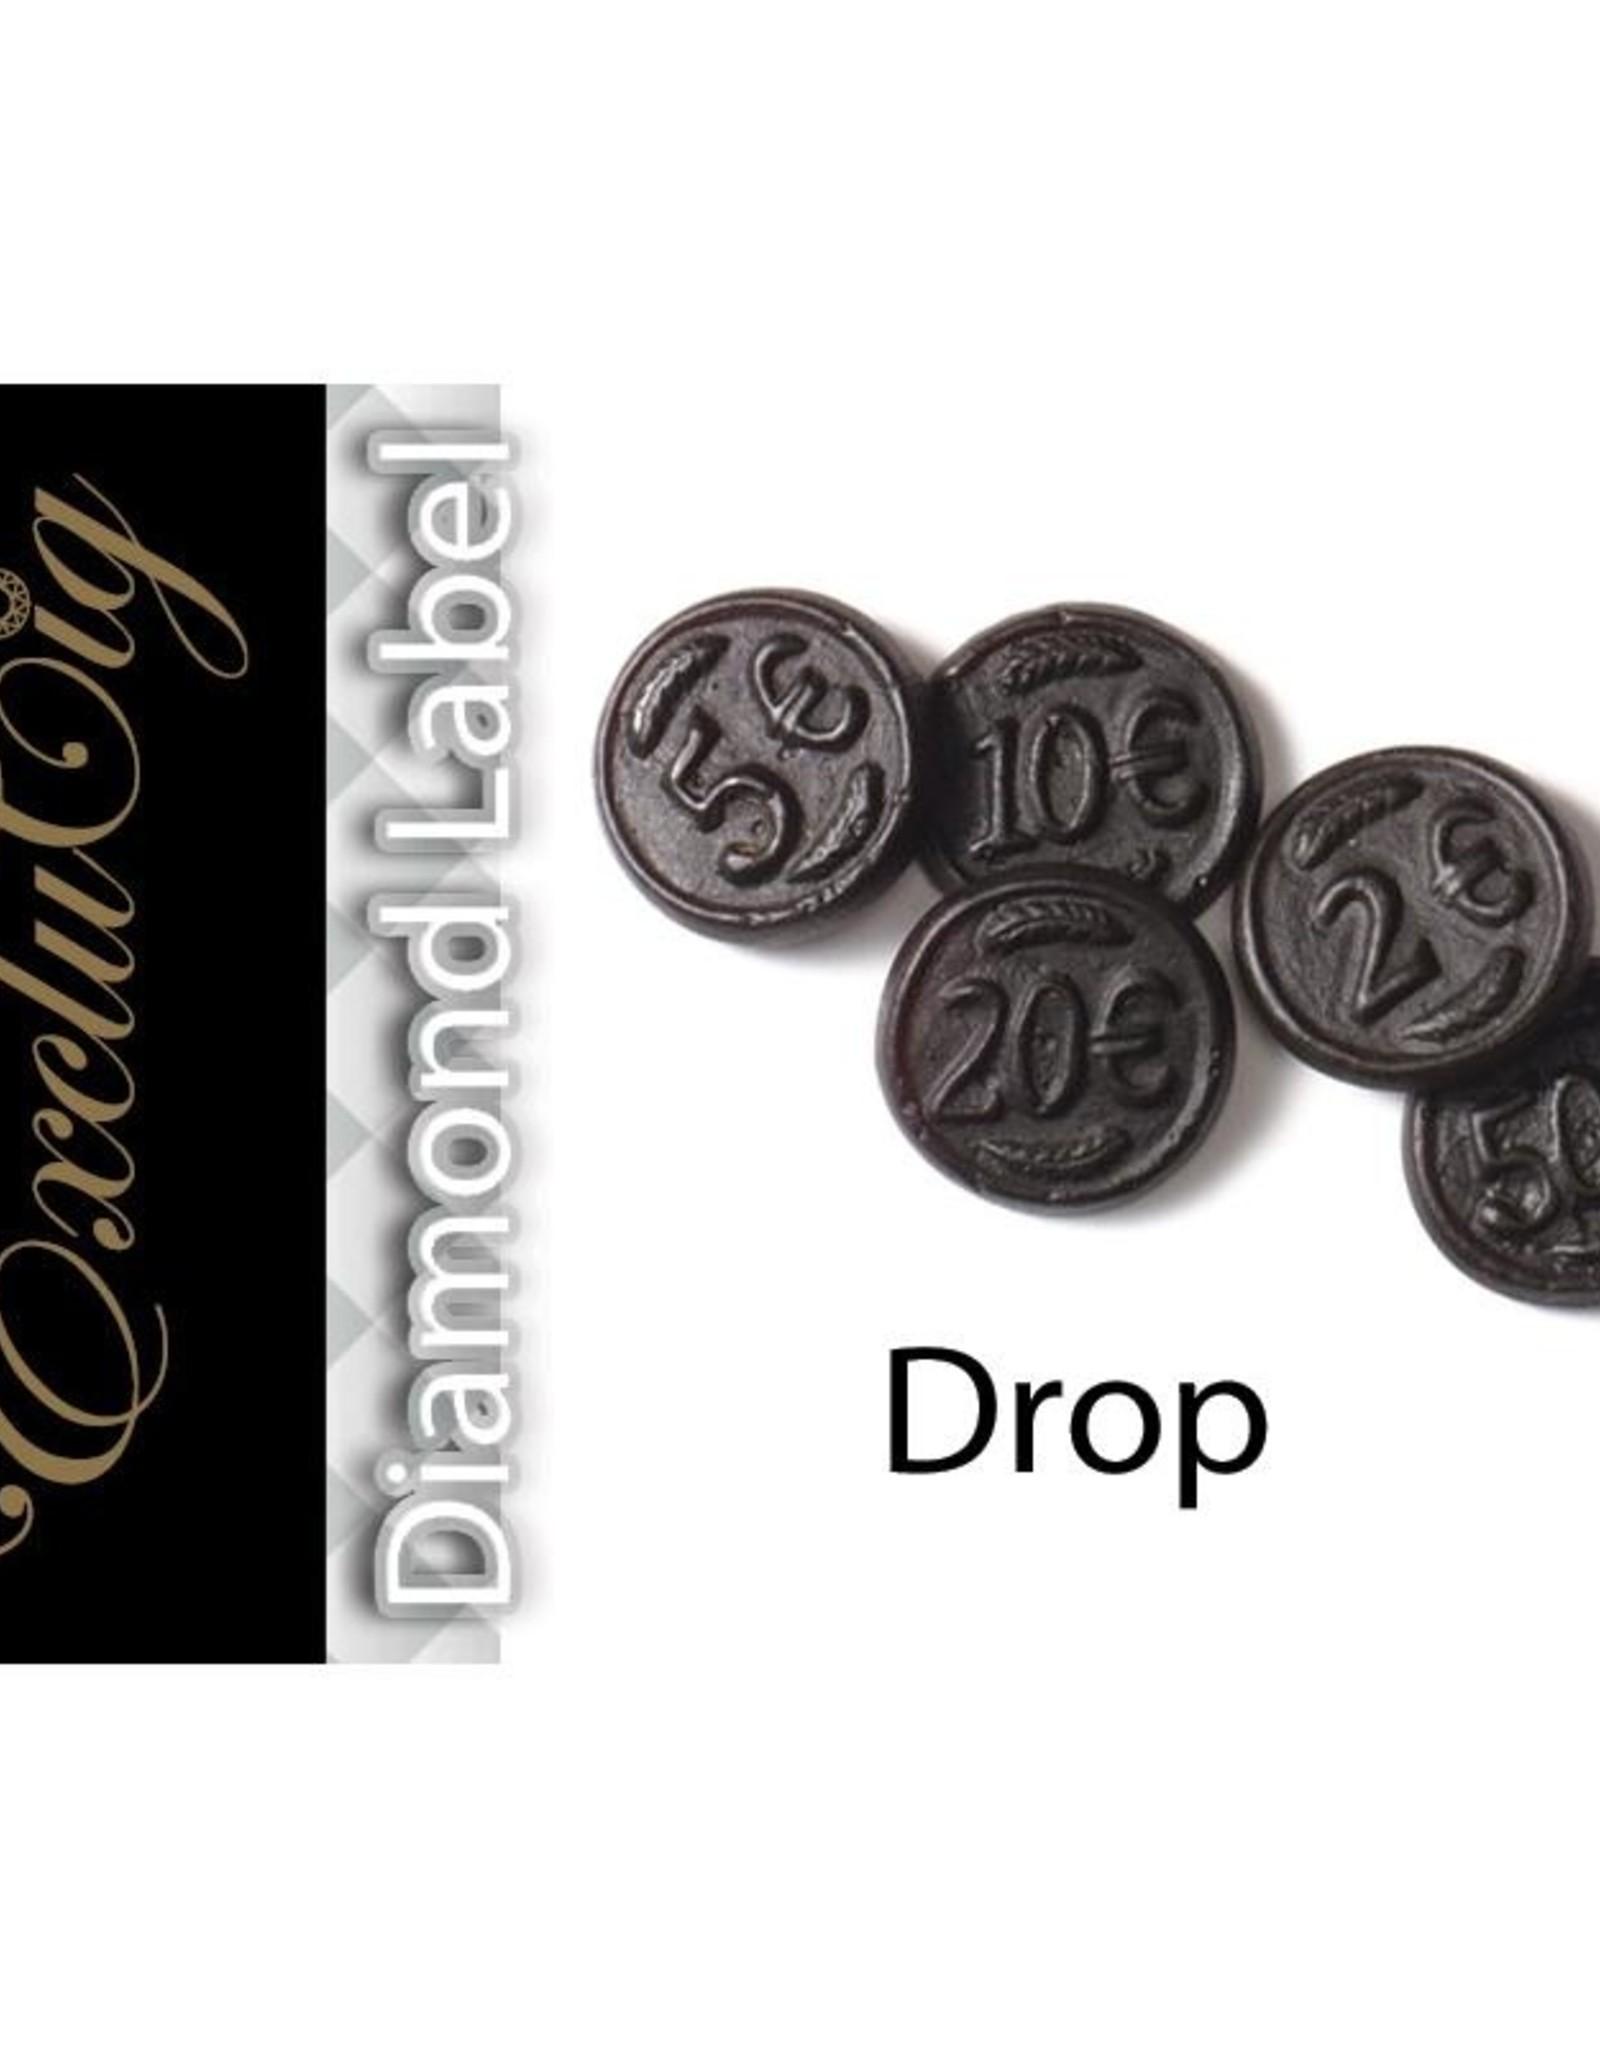 Exclucig Exclucig Diamond Label E-liquid Drop 3 mg Nicotine